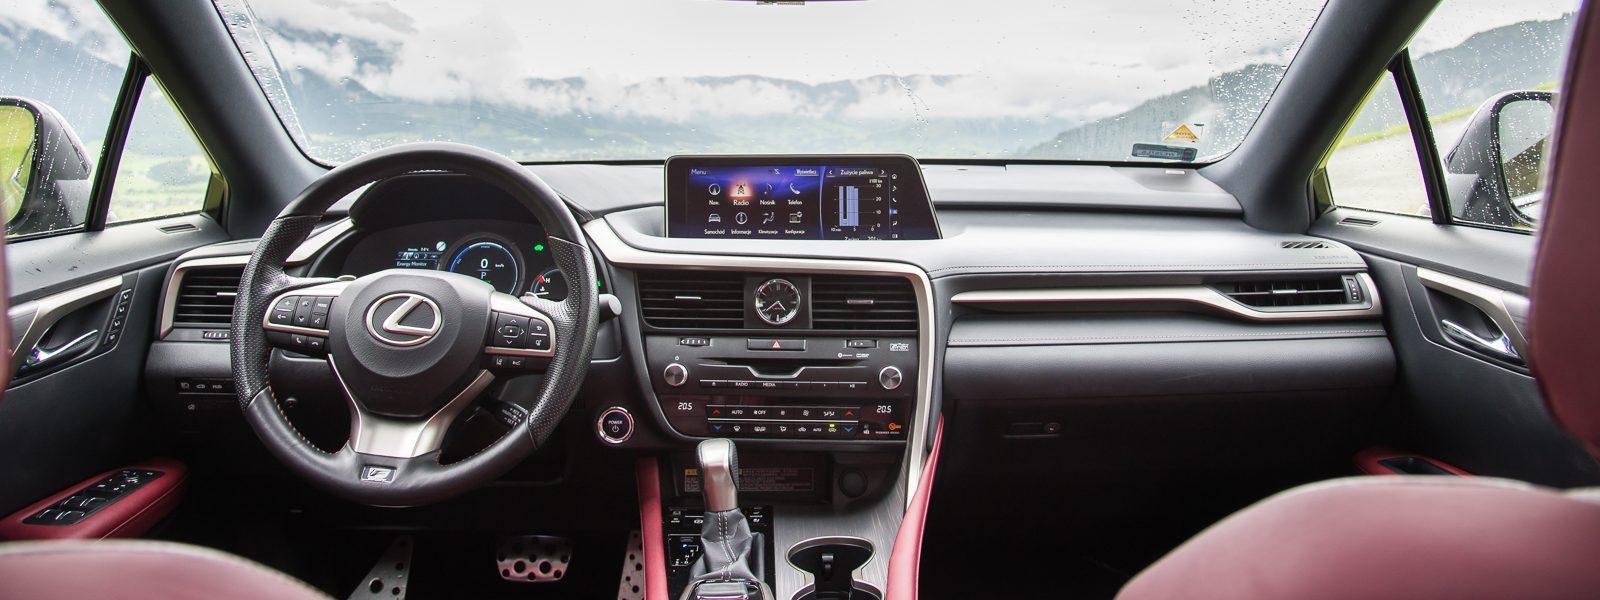 nowy-lexus-rx450h-fsport-wnetrze-test